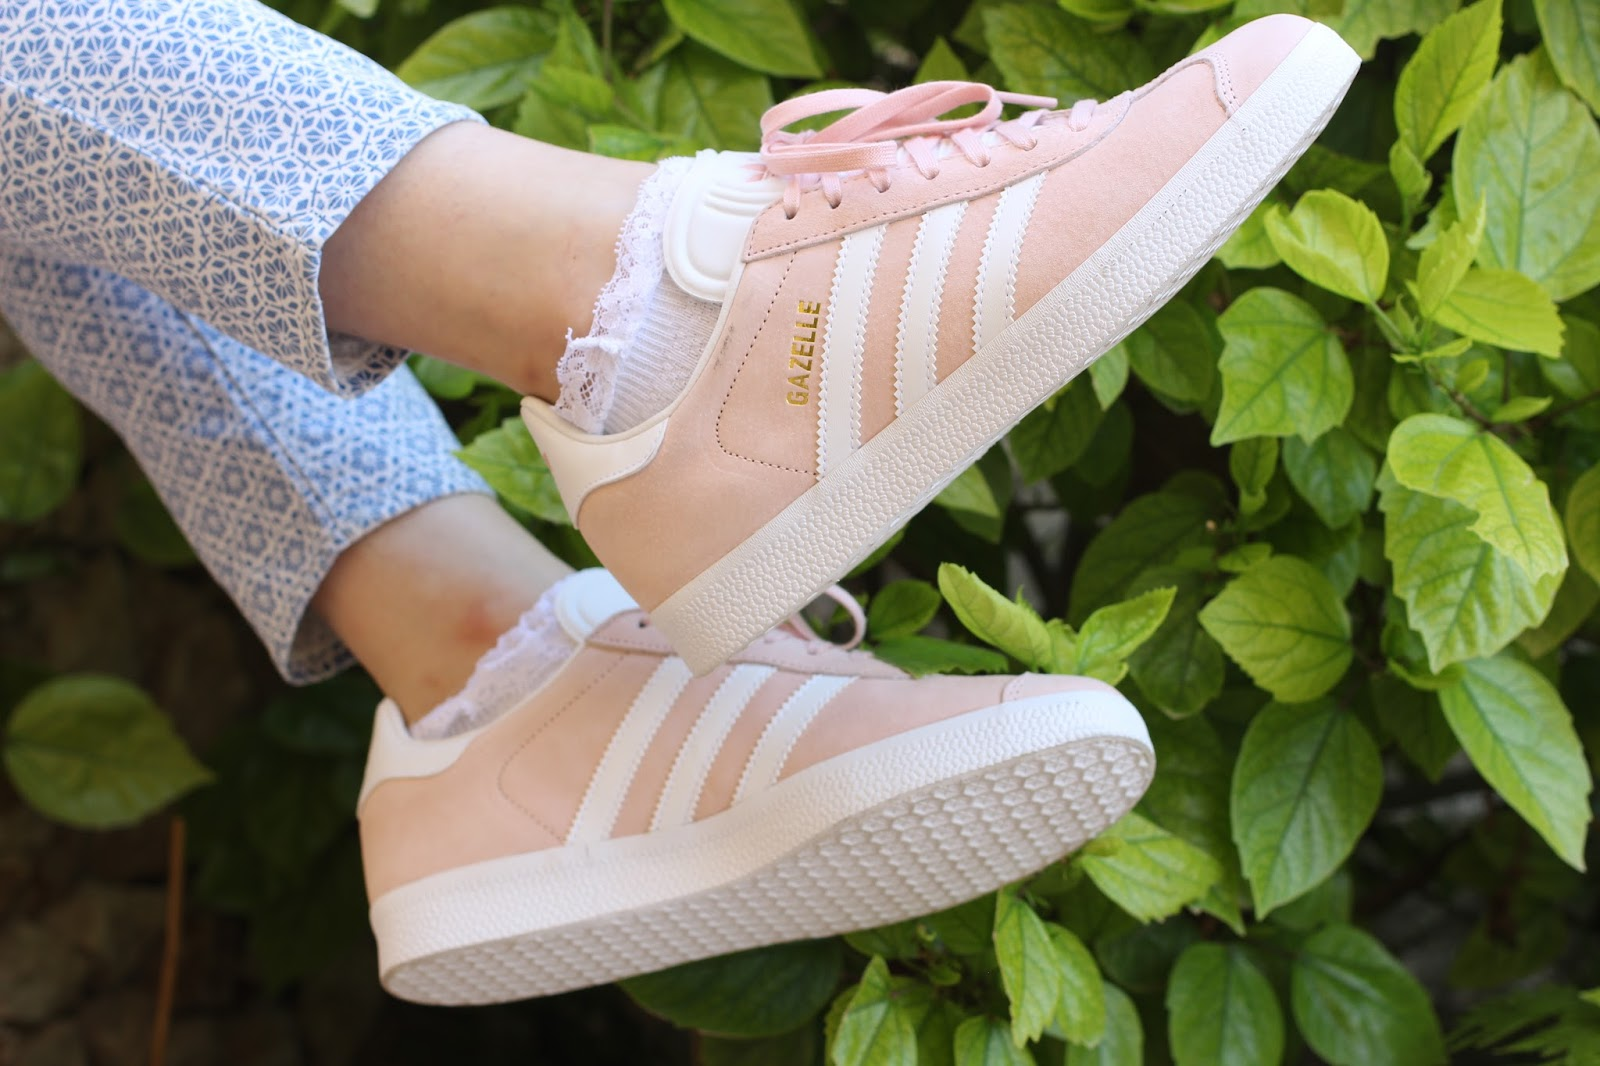 Adidas Gazelle Pale Pink